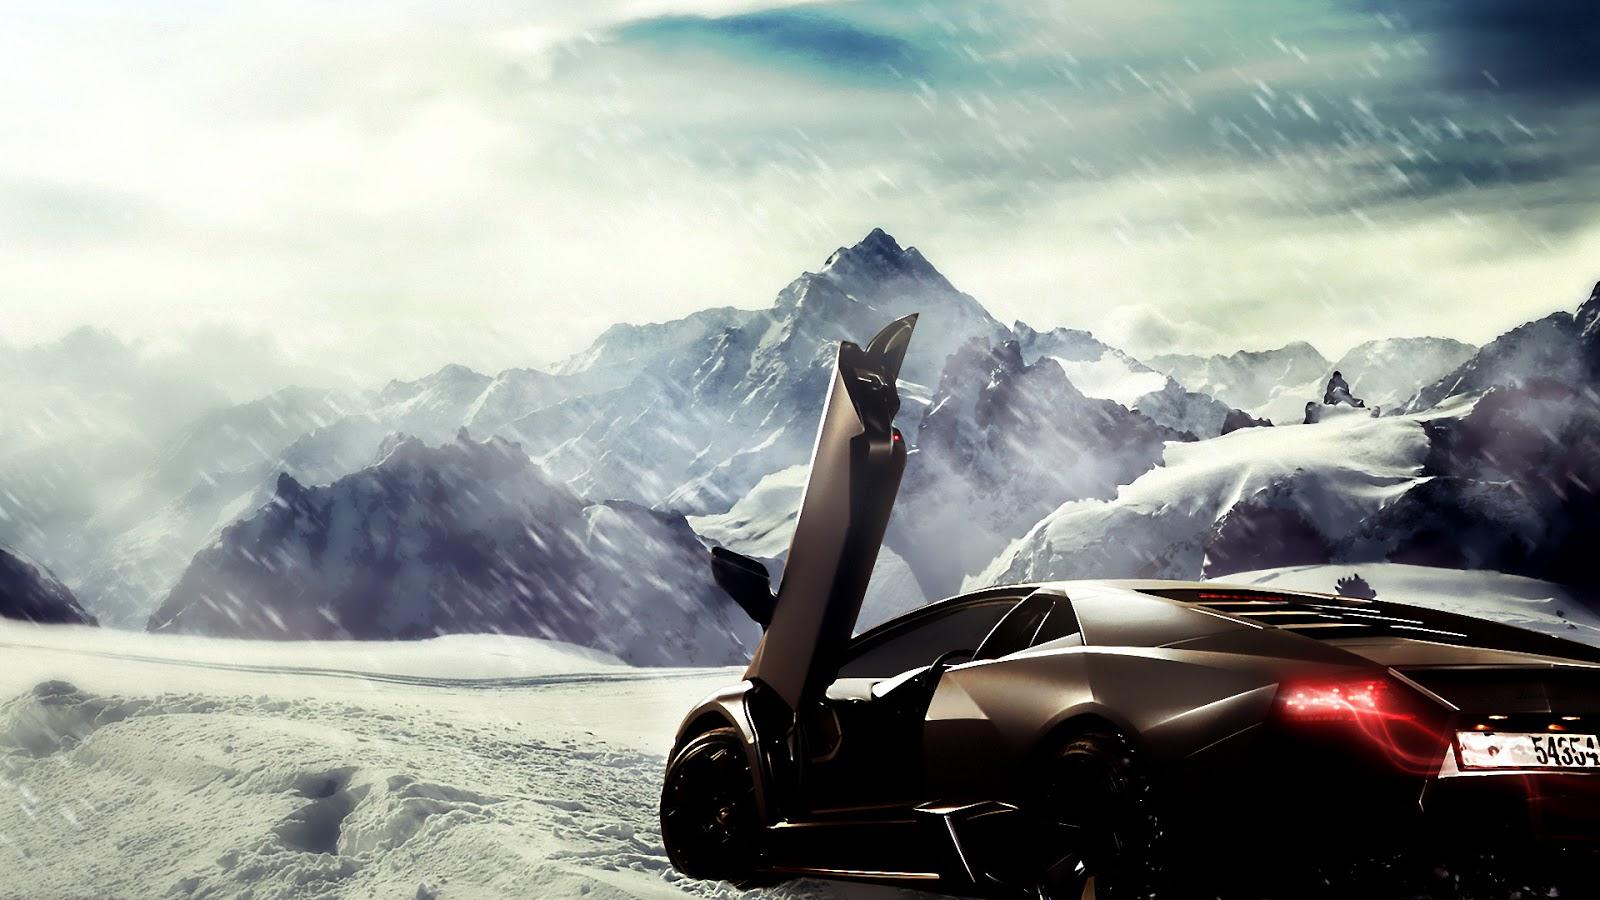 Lamborghini Aventador Wallpaper Free HD